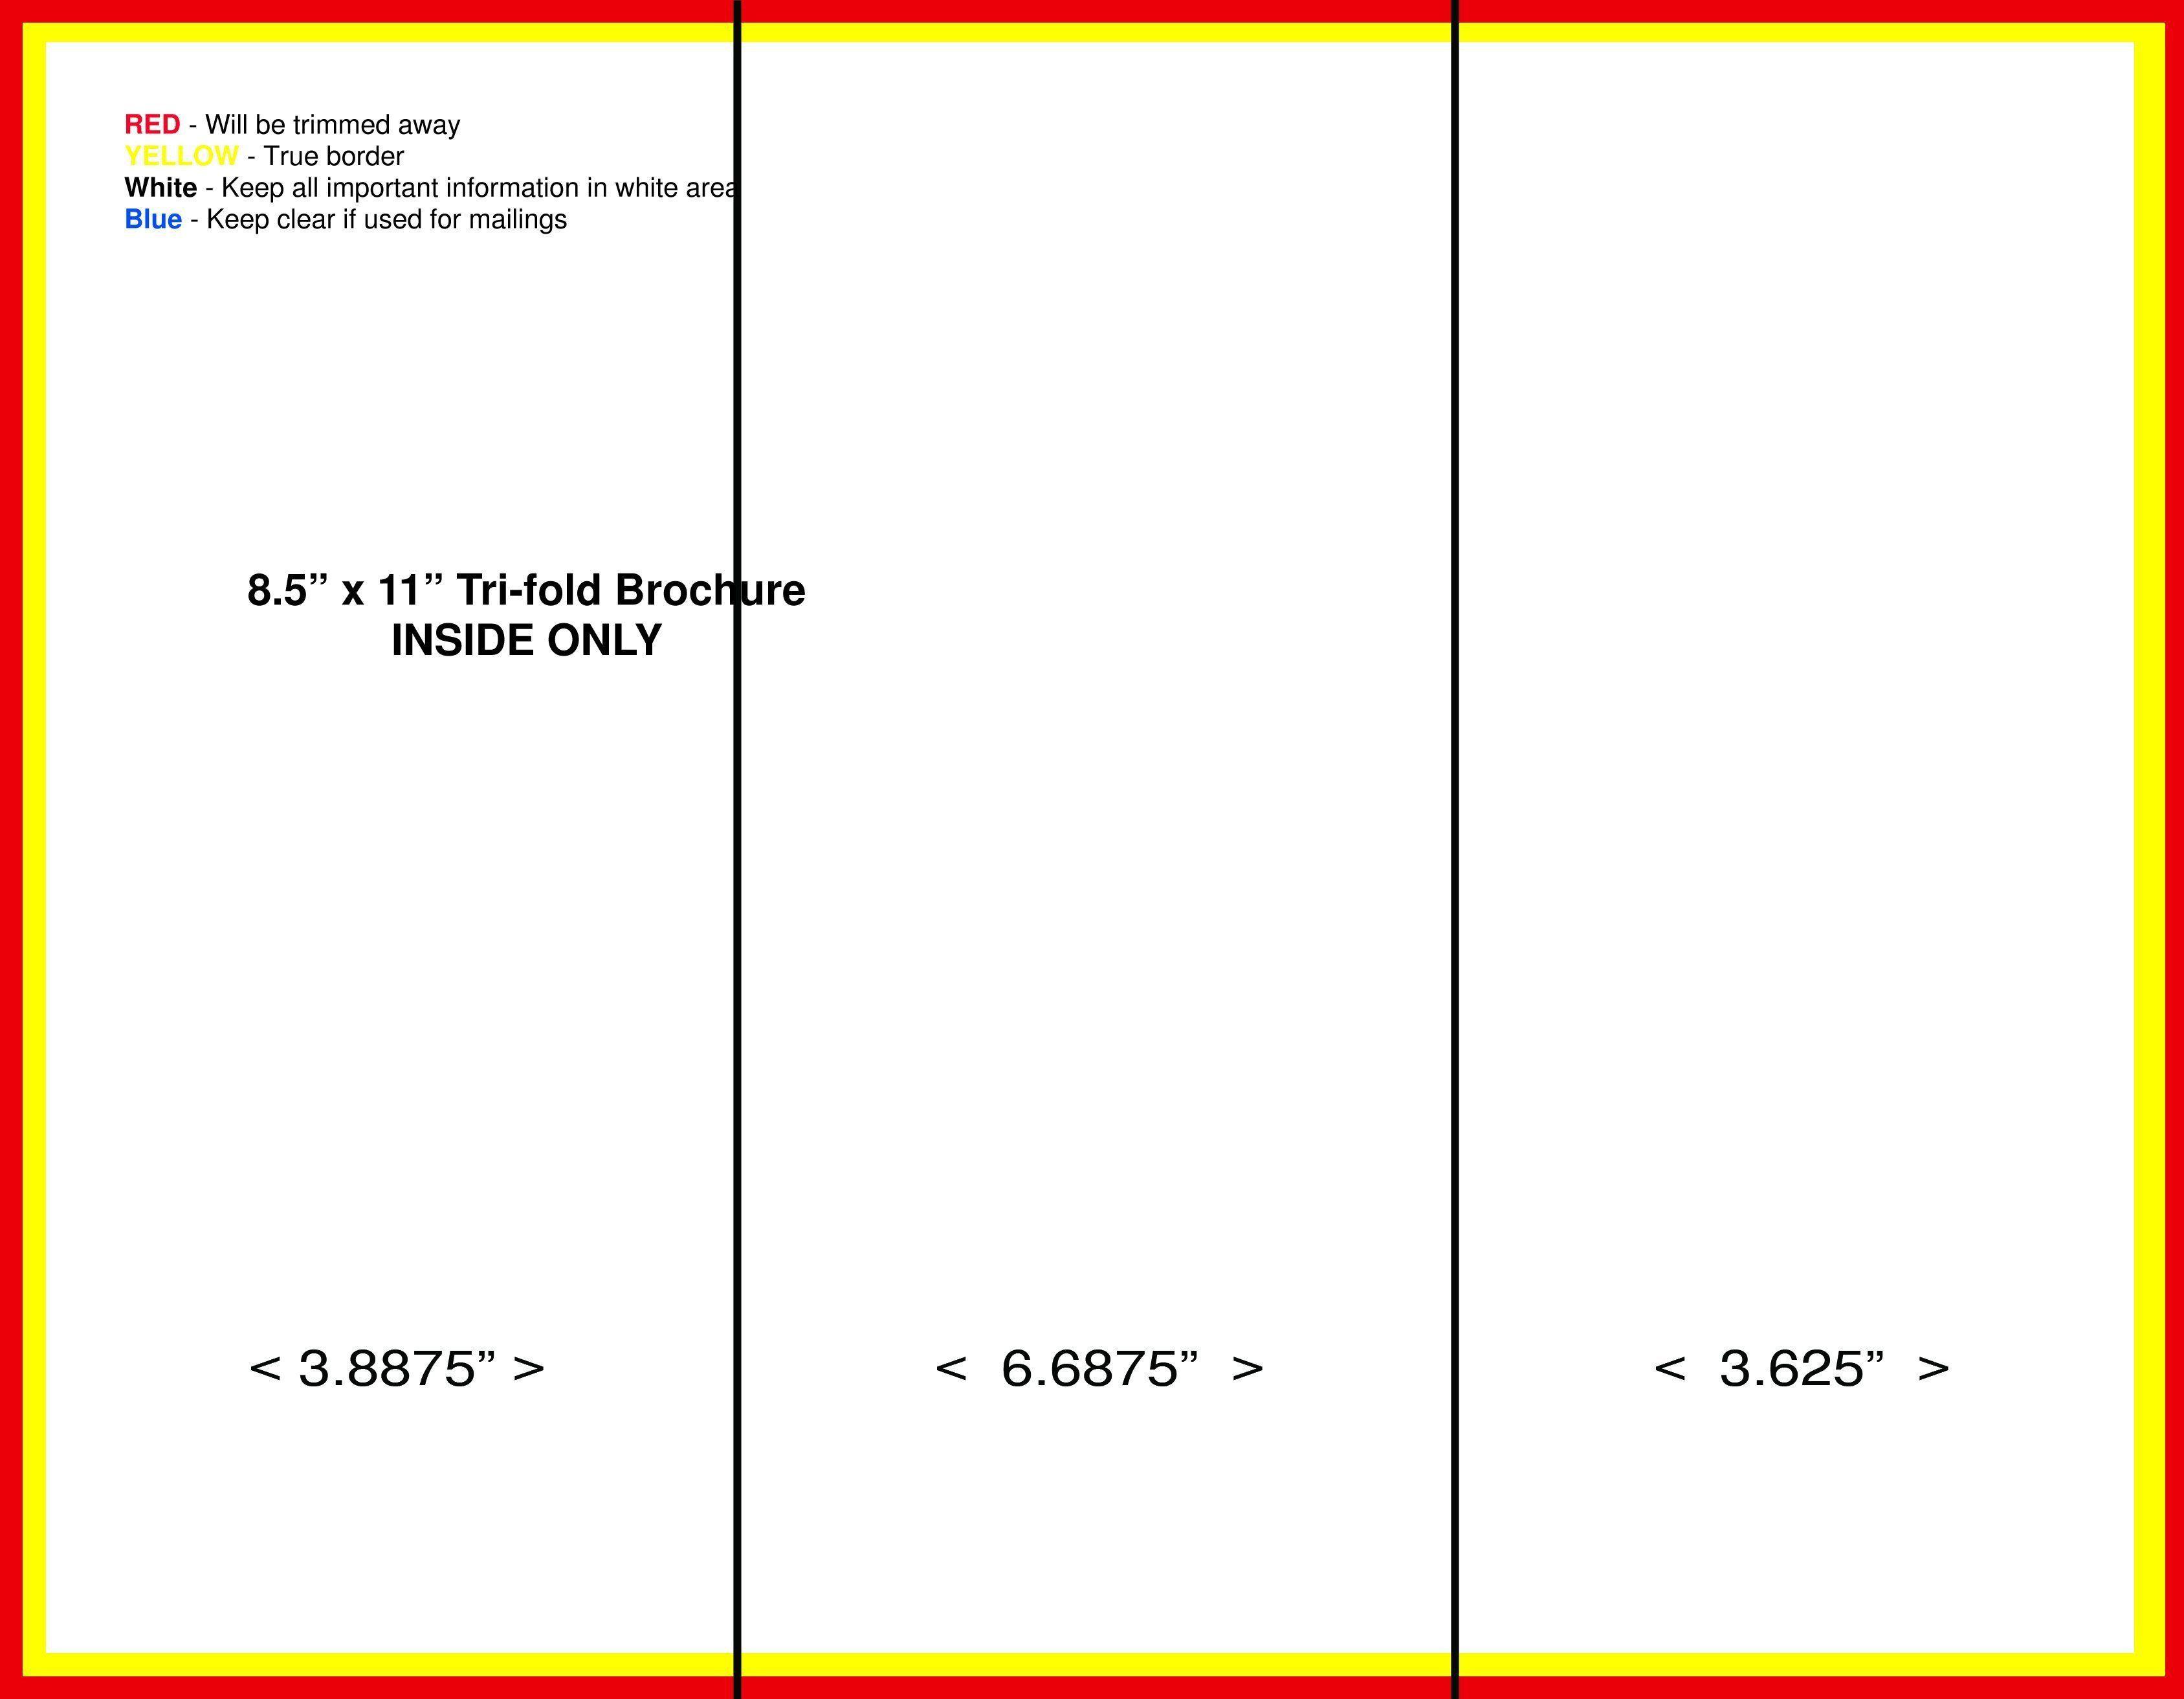 000 Surprising M Word Tri Fold Brochure Template Inspiration  Microsoft Free DownloadFull